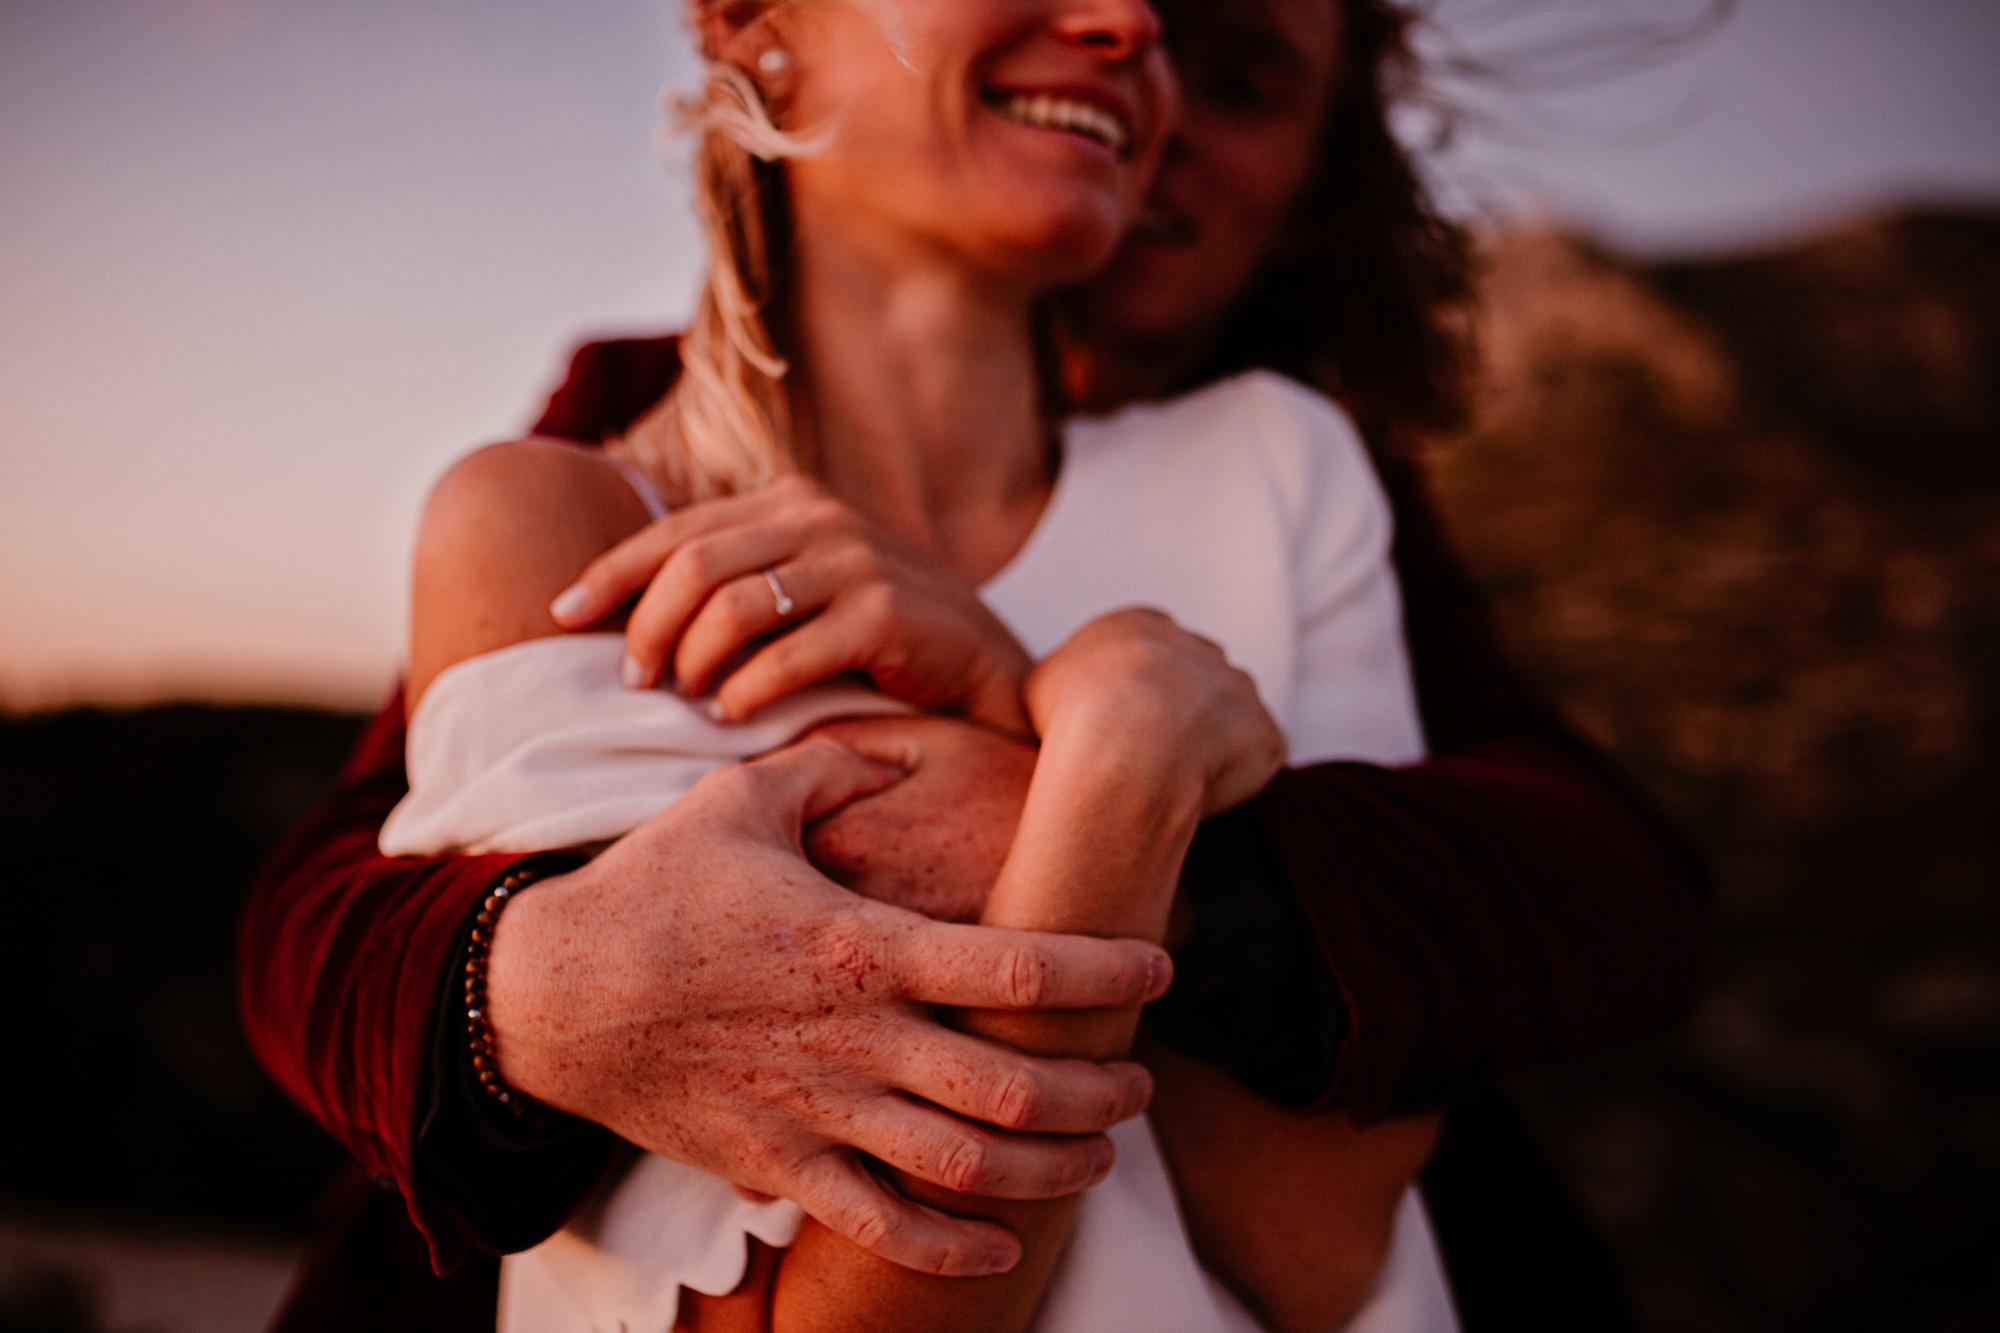 photographe couples séance engagement marseille calanques cassis france guadeloupe mariages